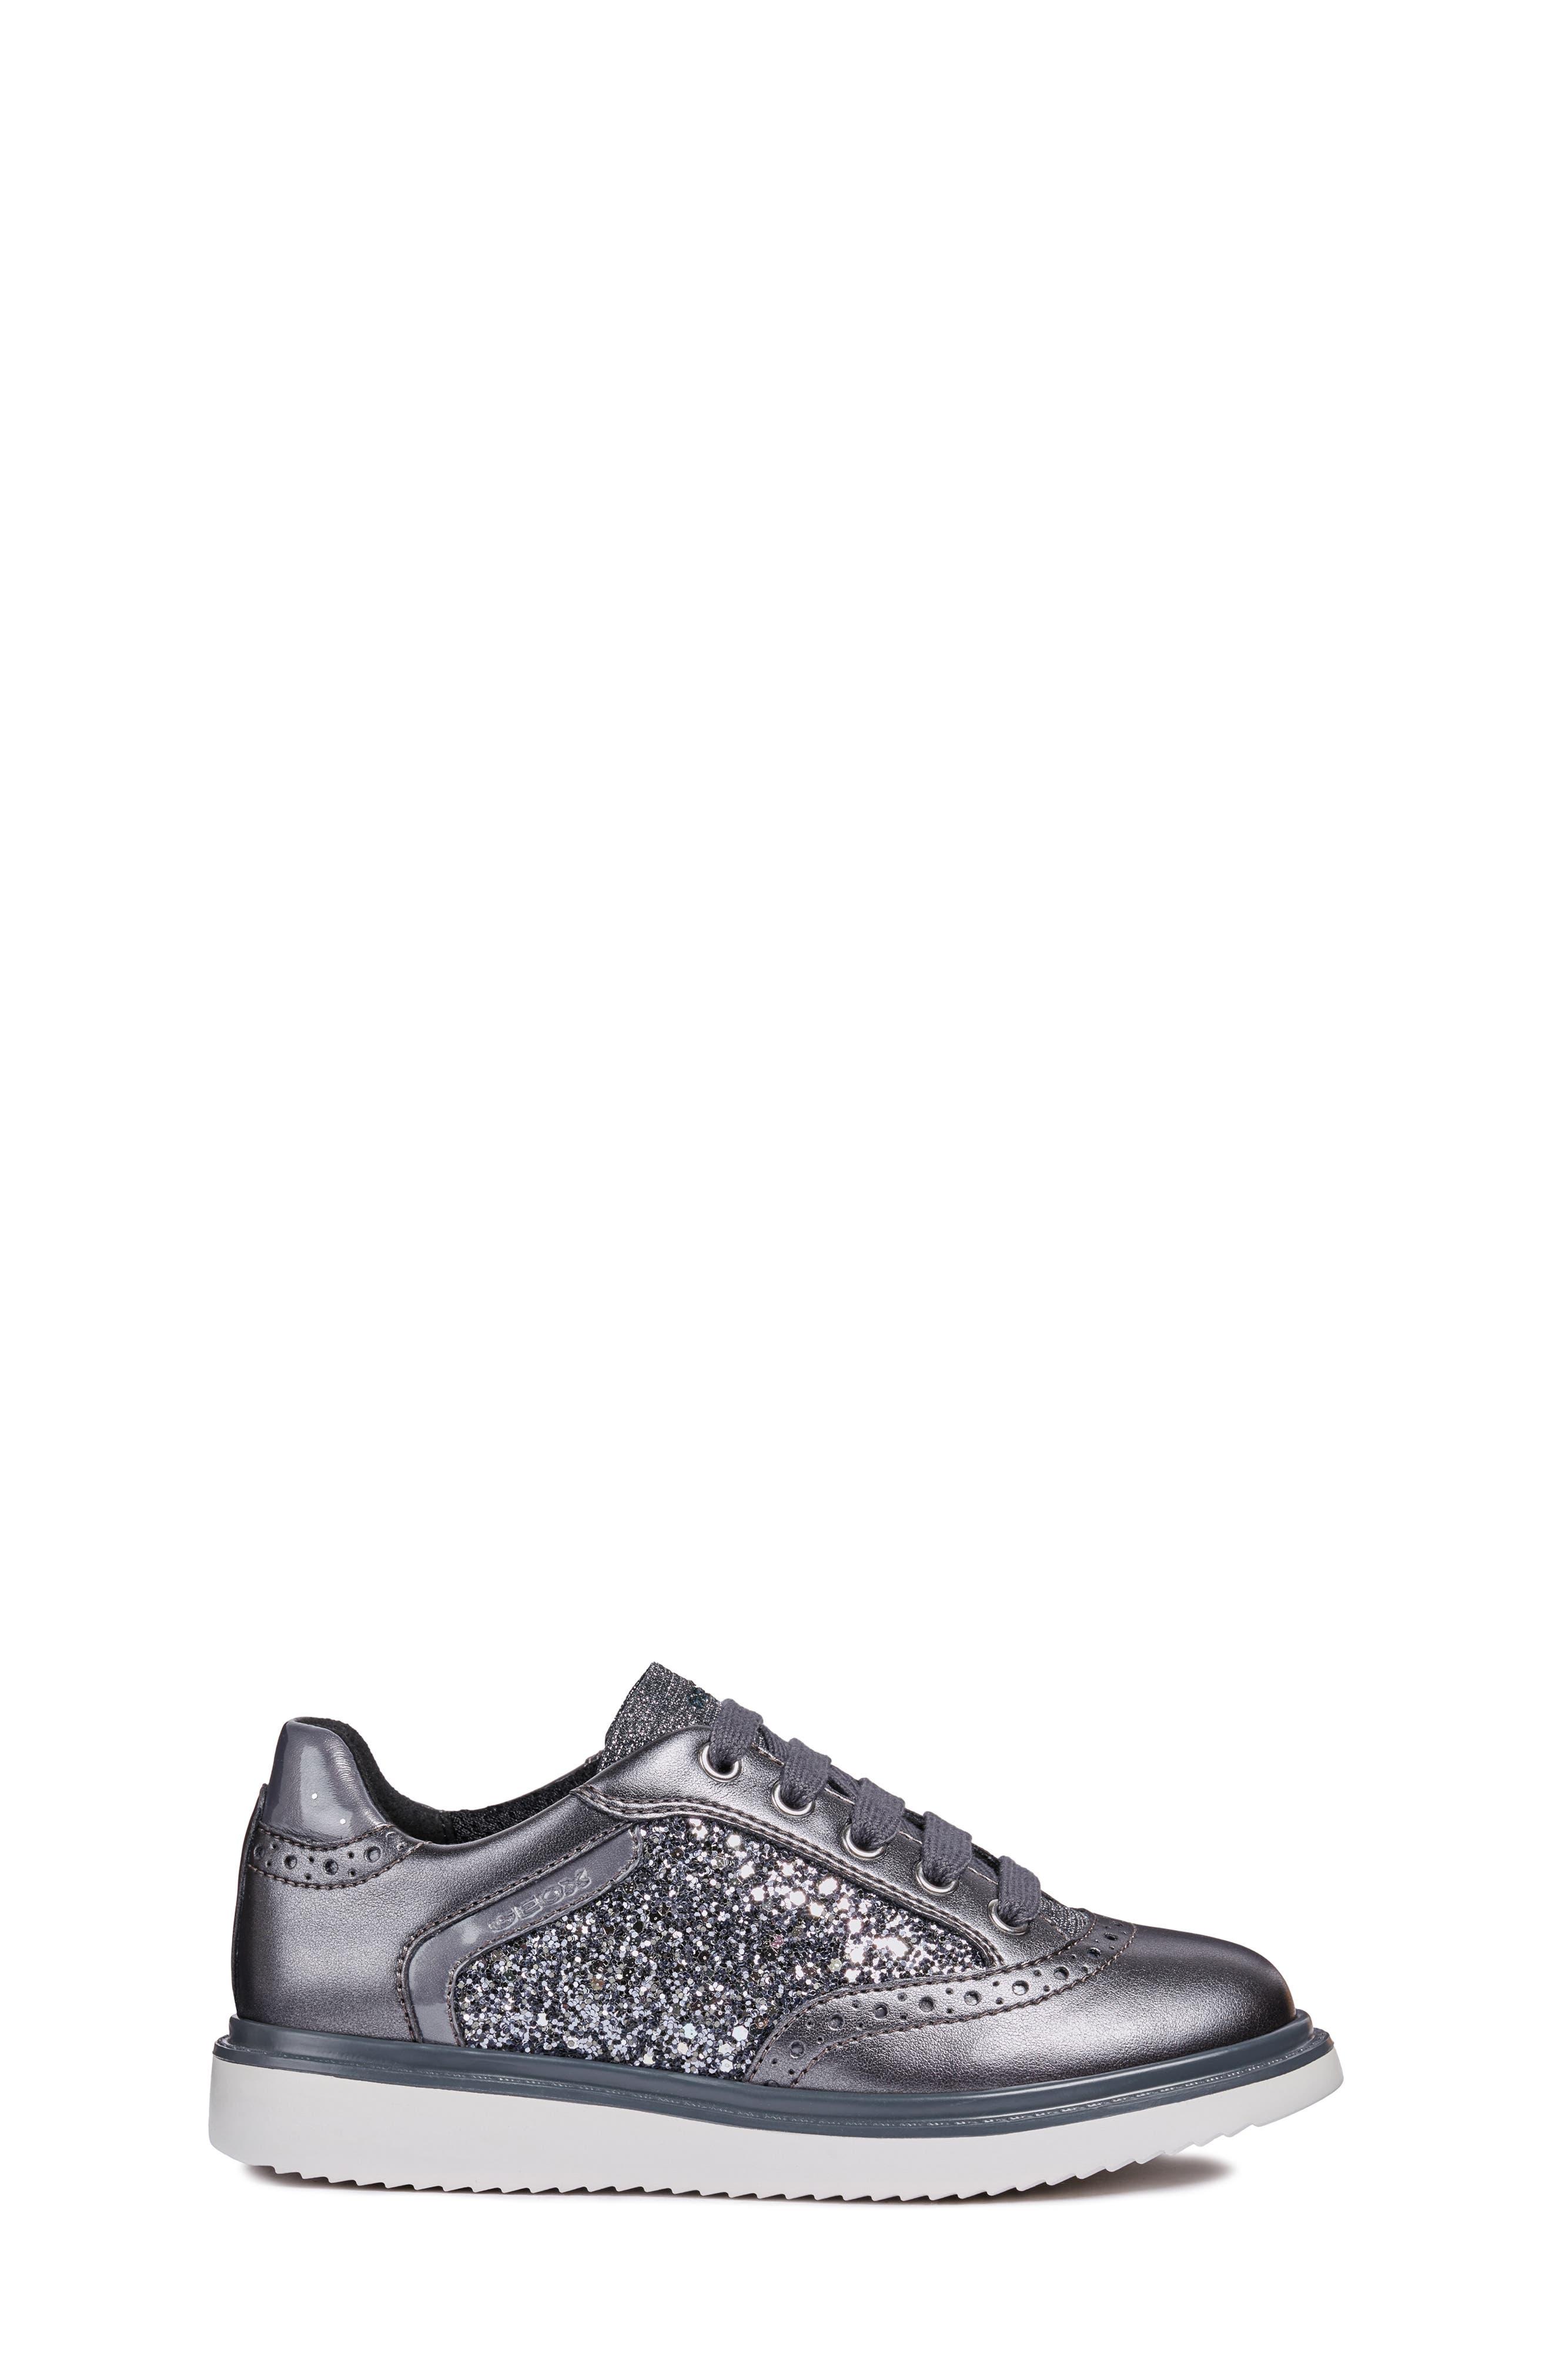 Thymar Sparkle Sneaker,                             Alternate thumbnail 3, color,                             DARK SILVER